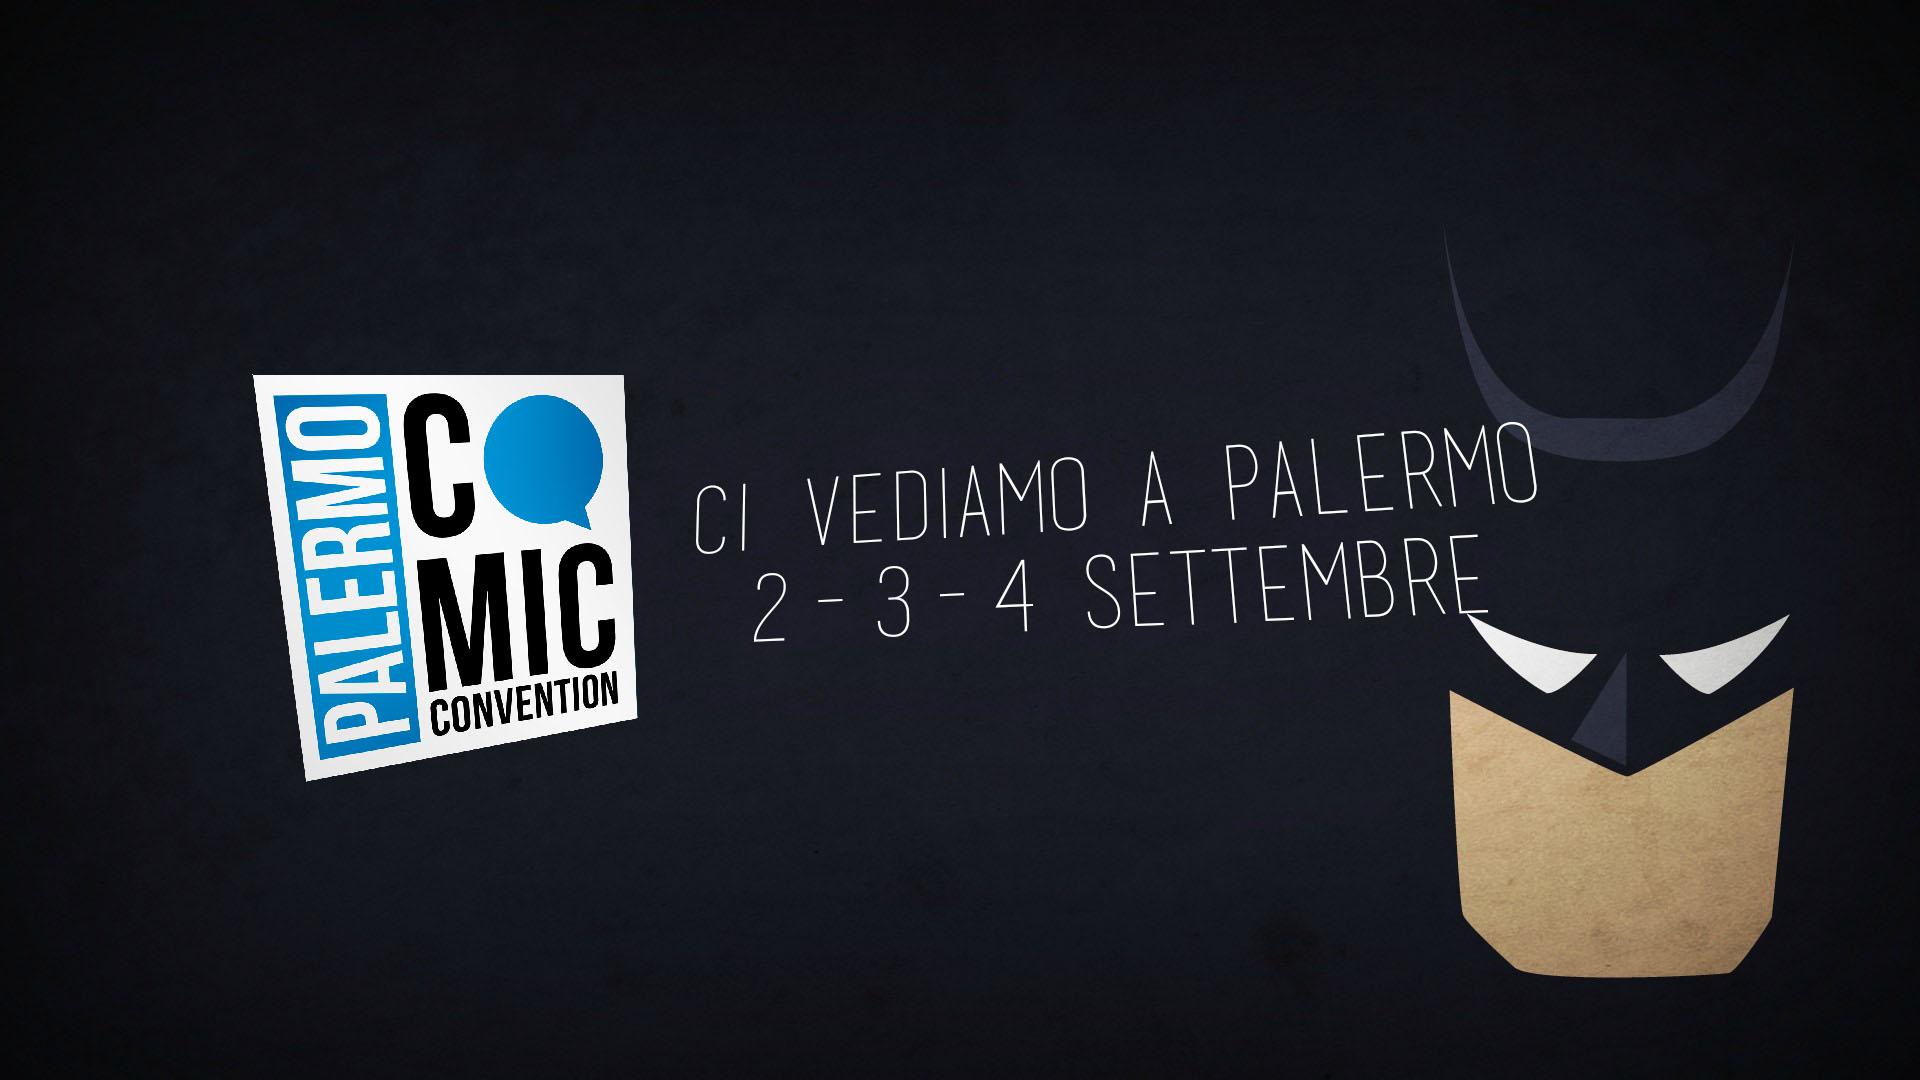 Vado anch'io a Palermo! PALERMO COMIC CONVENTION 2016